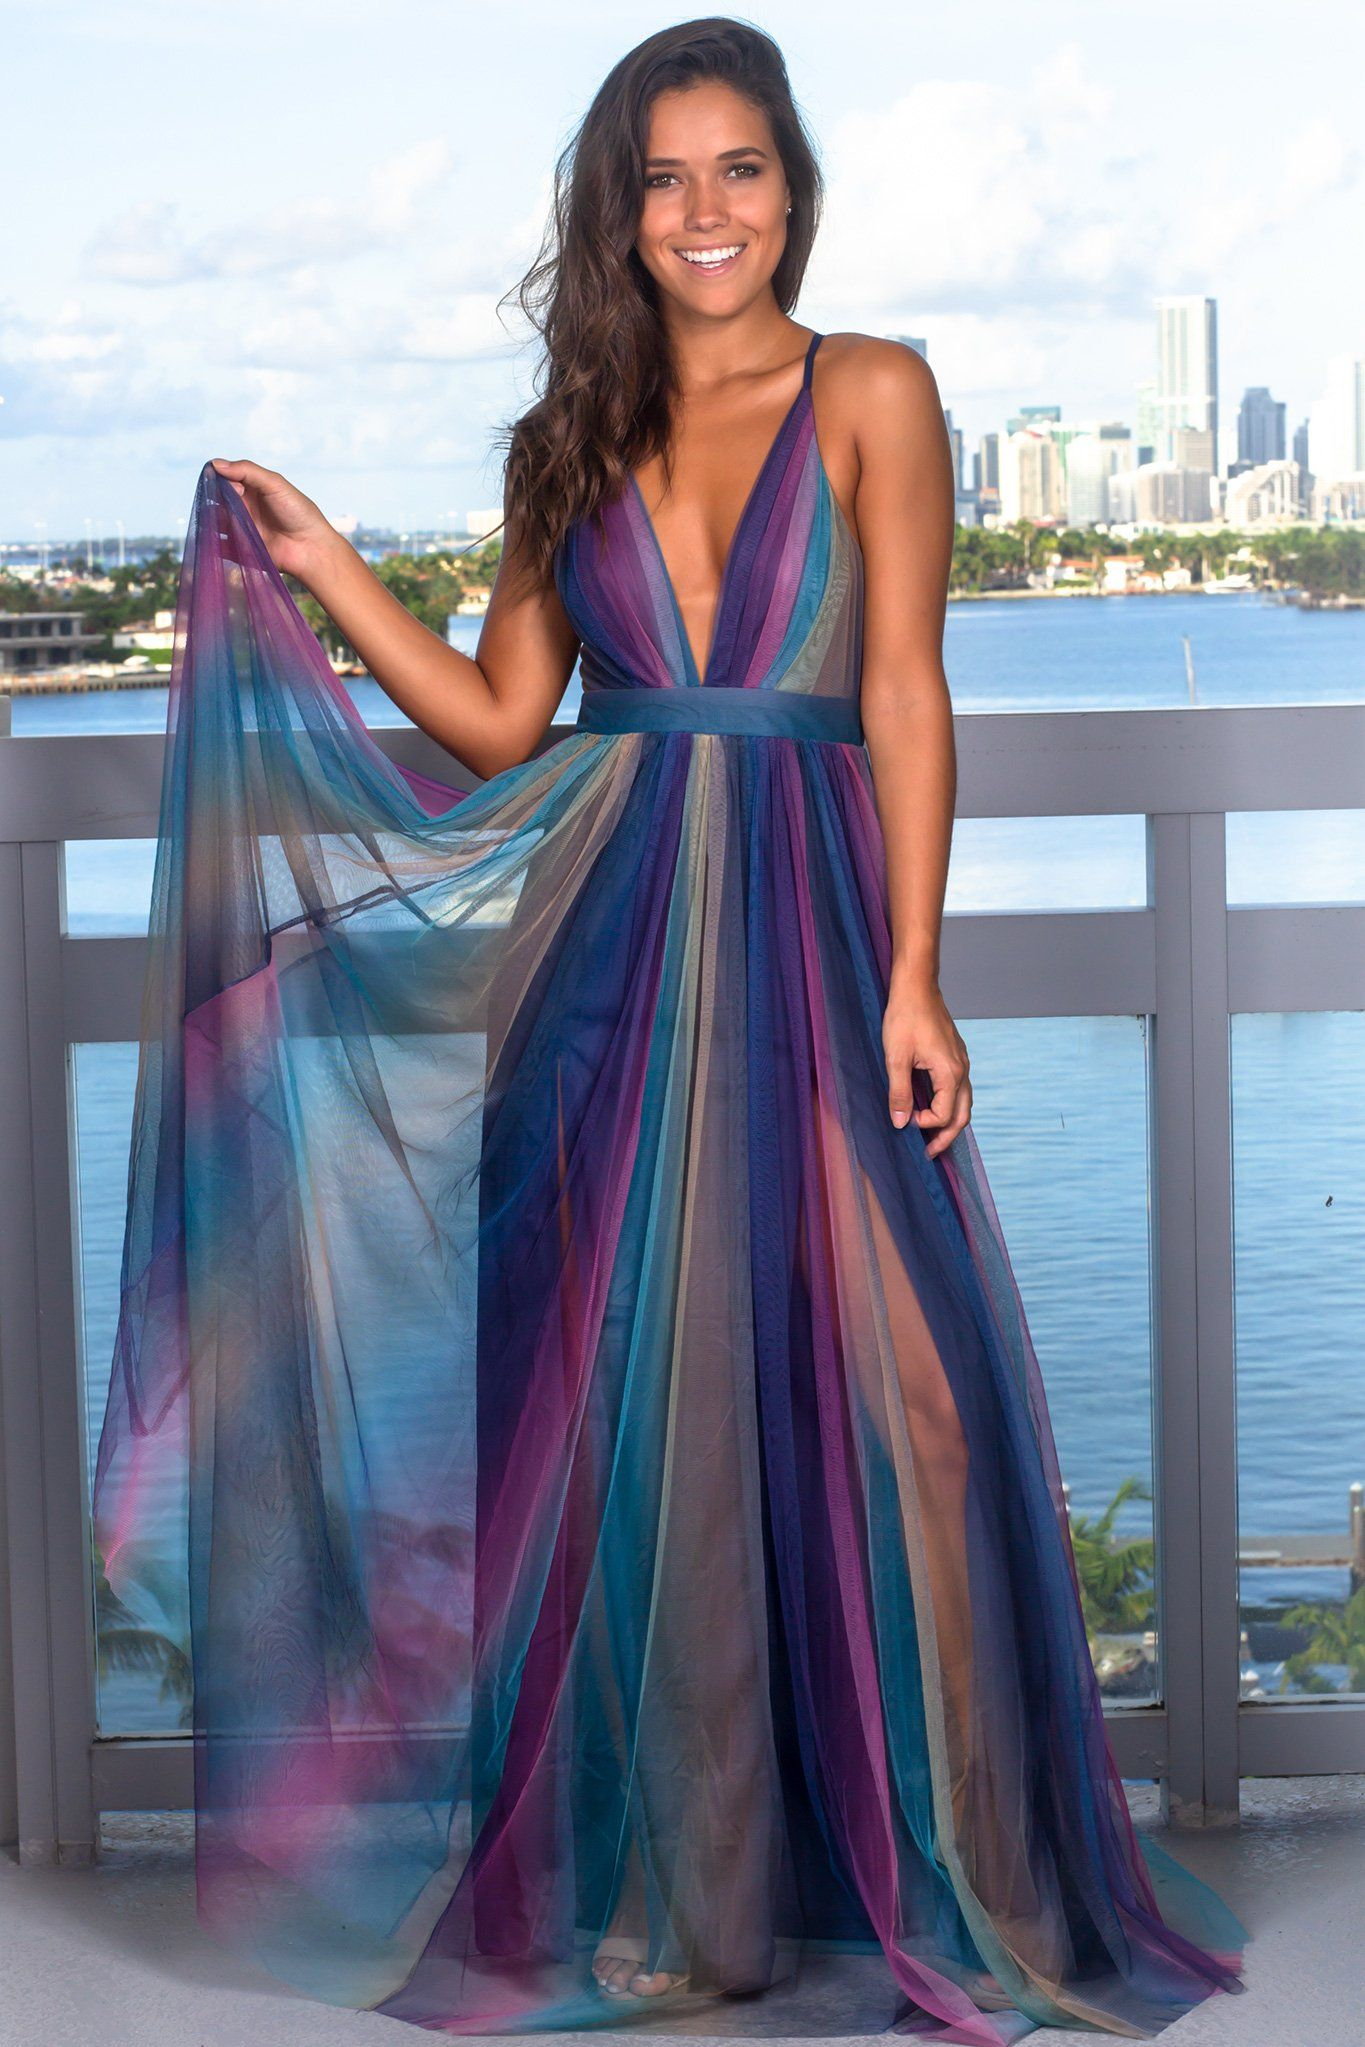 bb4493f11bdb Navy Rainbow Maxi Dress | Clothing | Dresses, Flowy skirt, Boutique ...